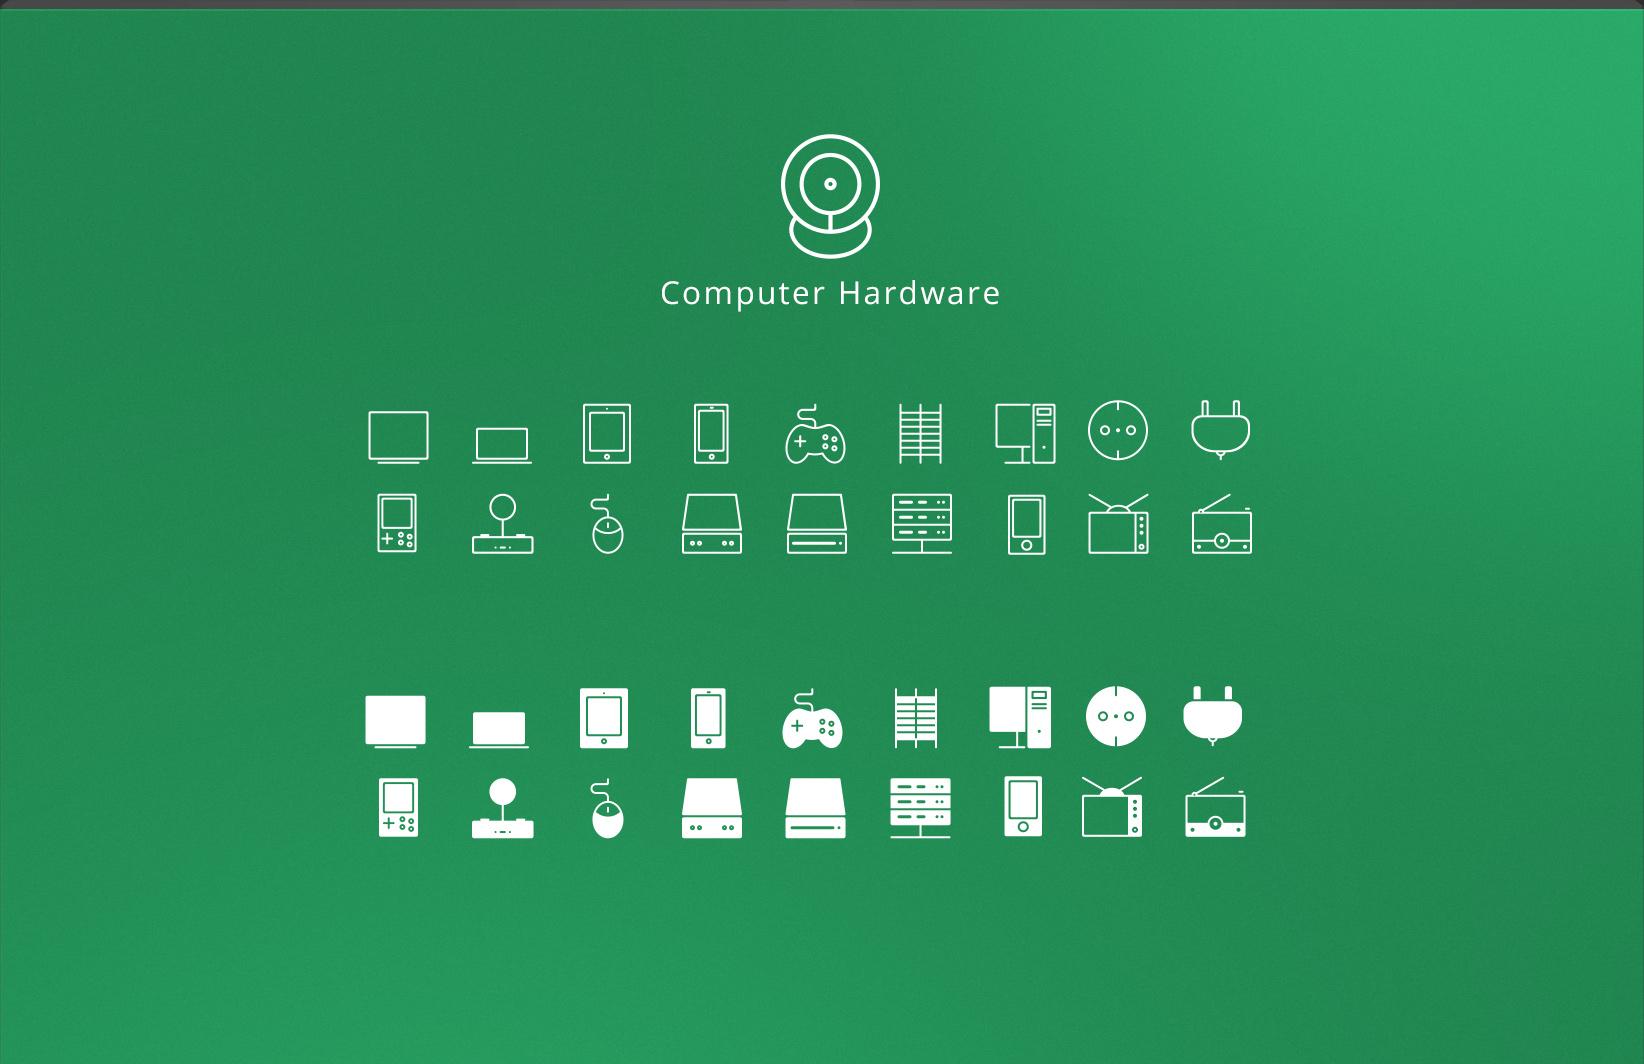 Design, Photo & Graphics Software, Designer Membership from PixelKit.com Screenshot